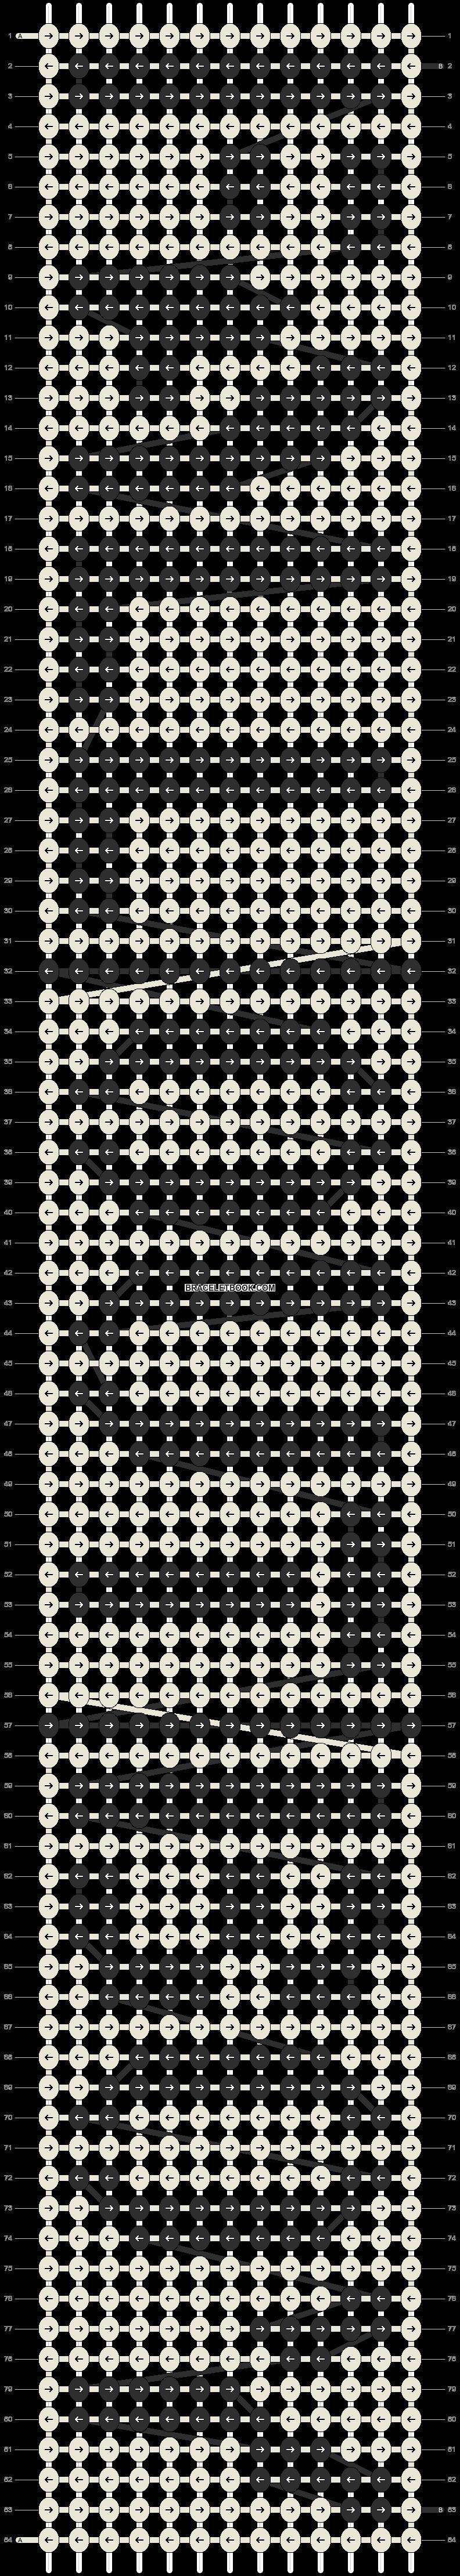 Alpha pattern #12219 pattern